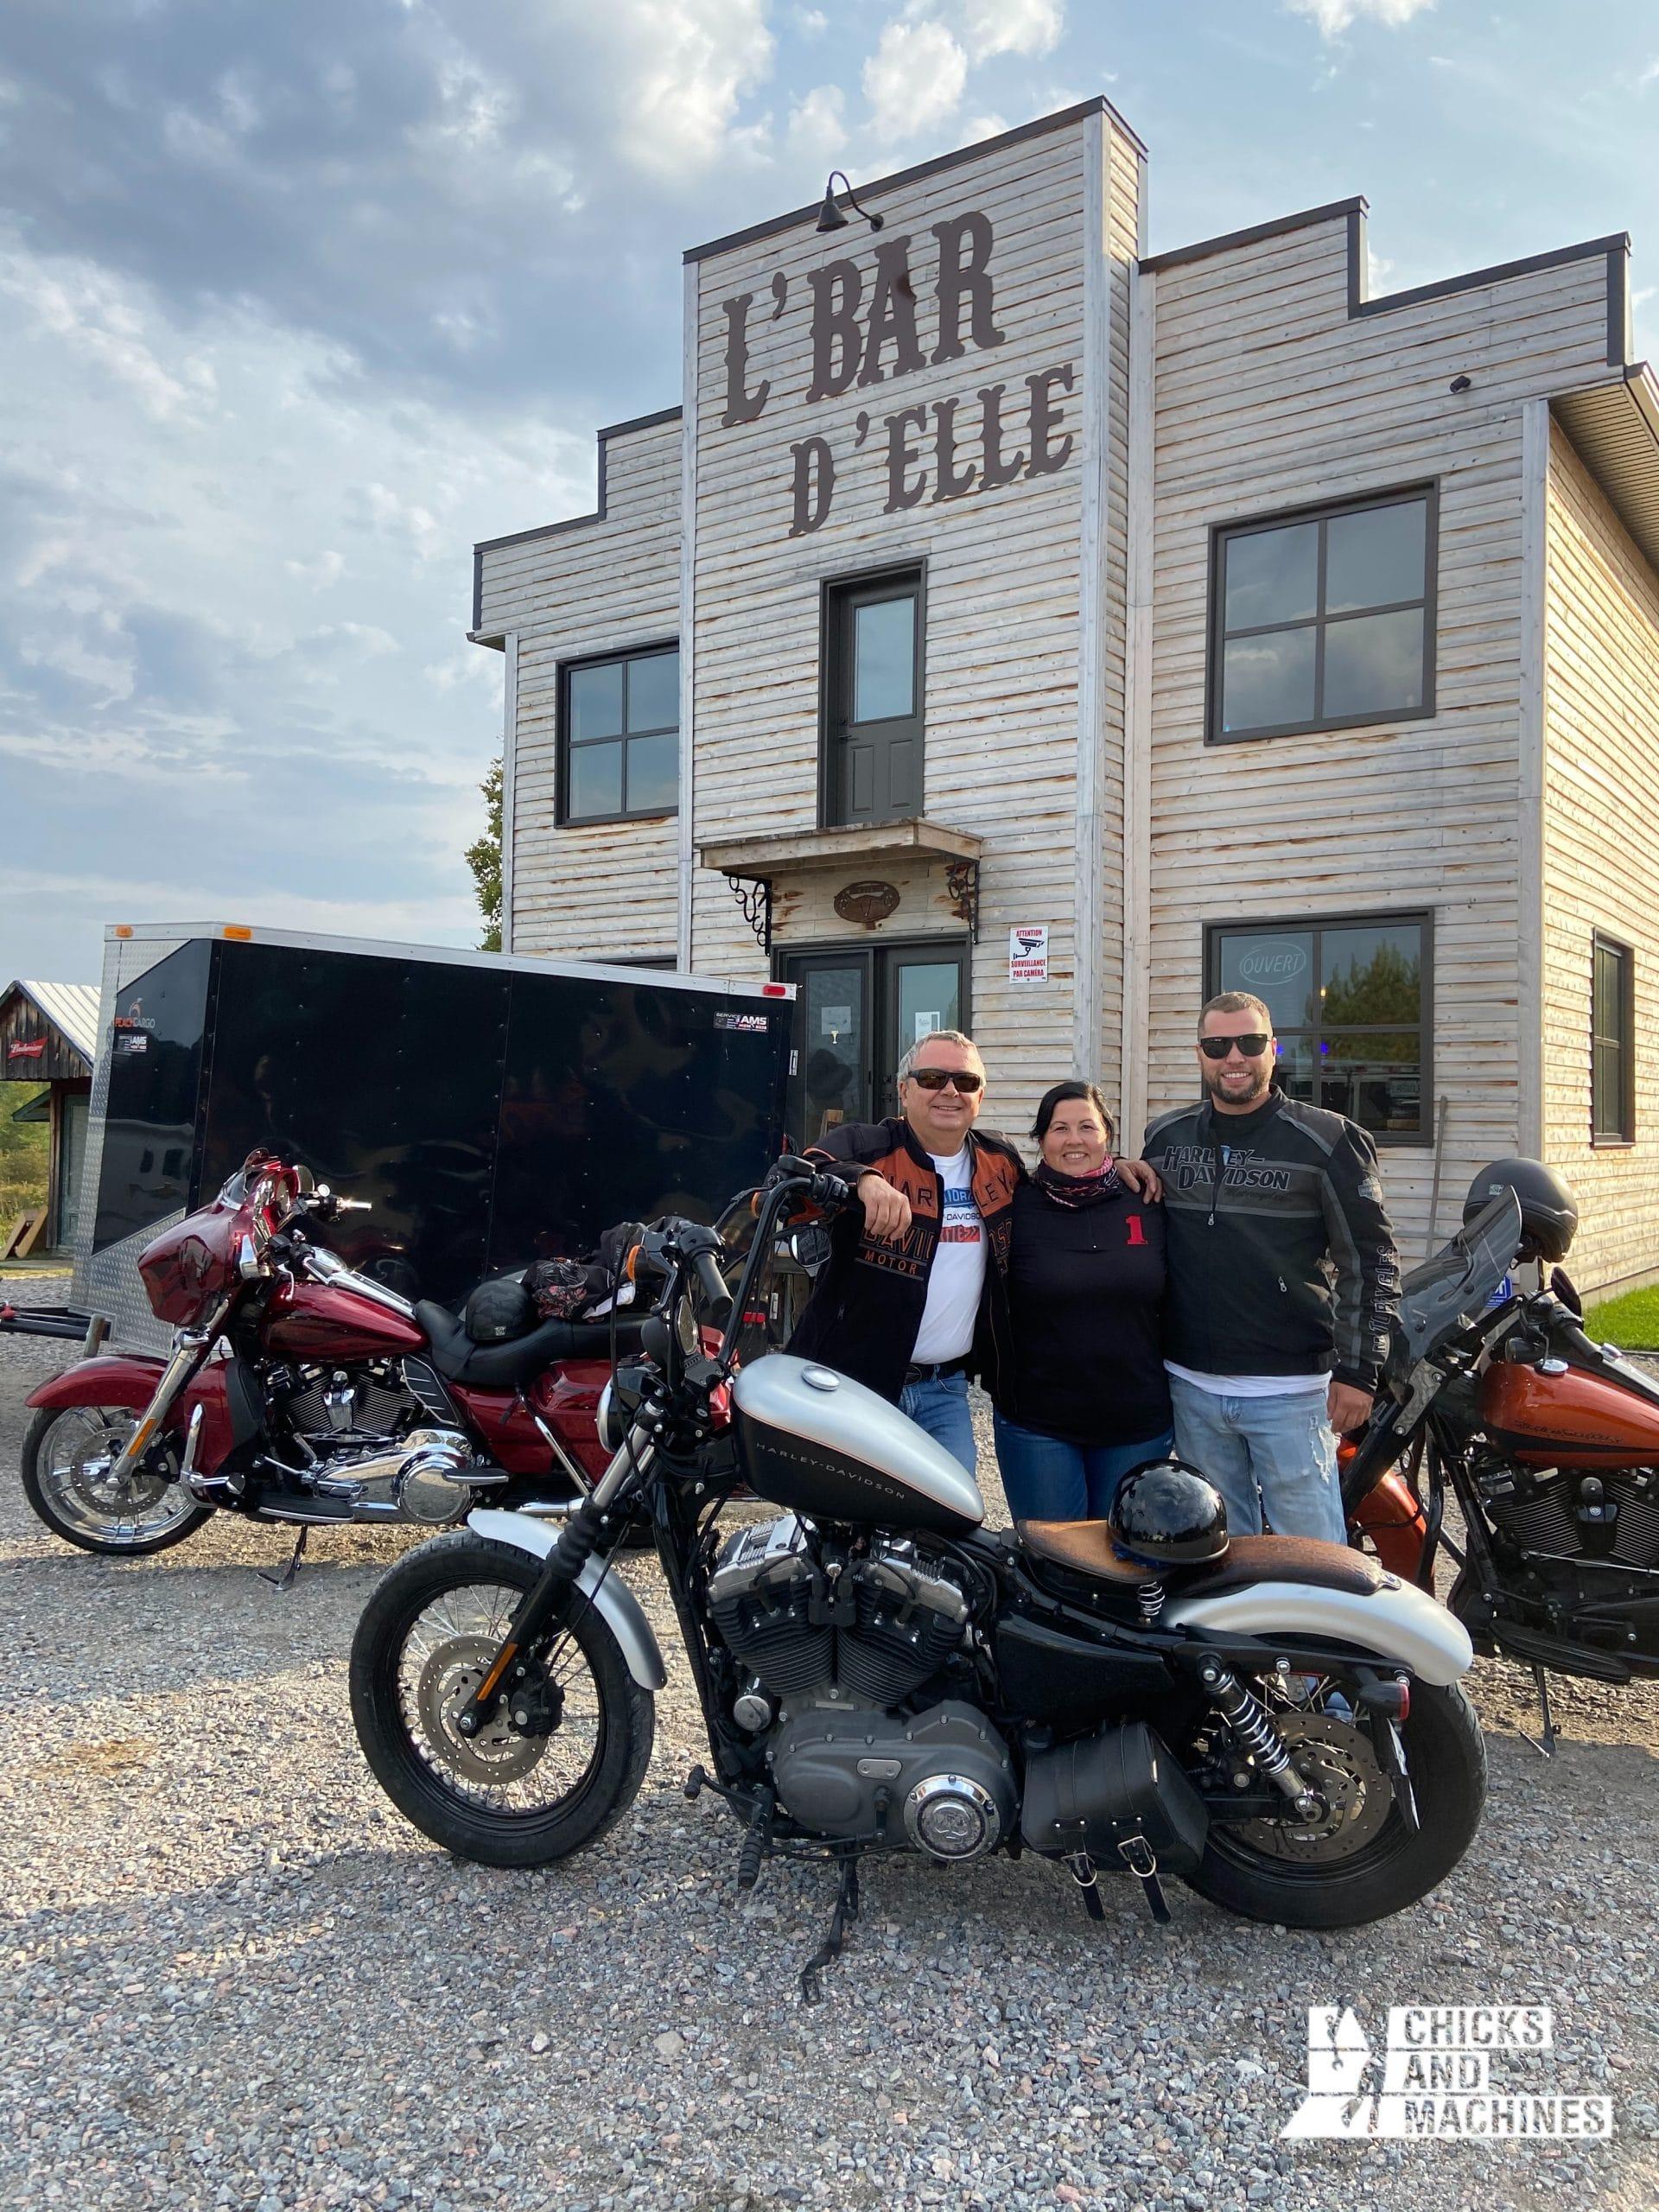 Roadtrip à moto : Au Bar d'Elle - Sainte-Jeanne d'Arc